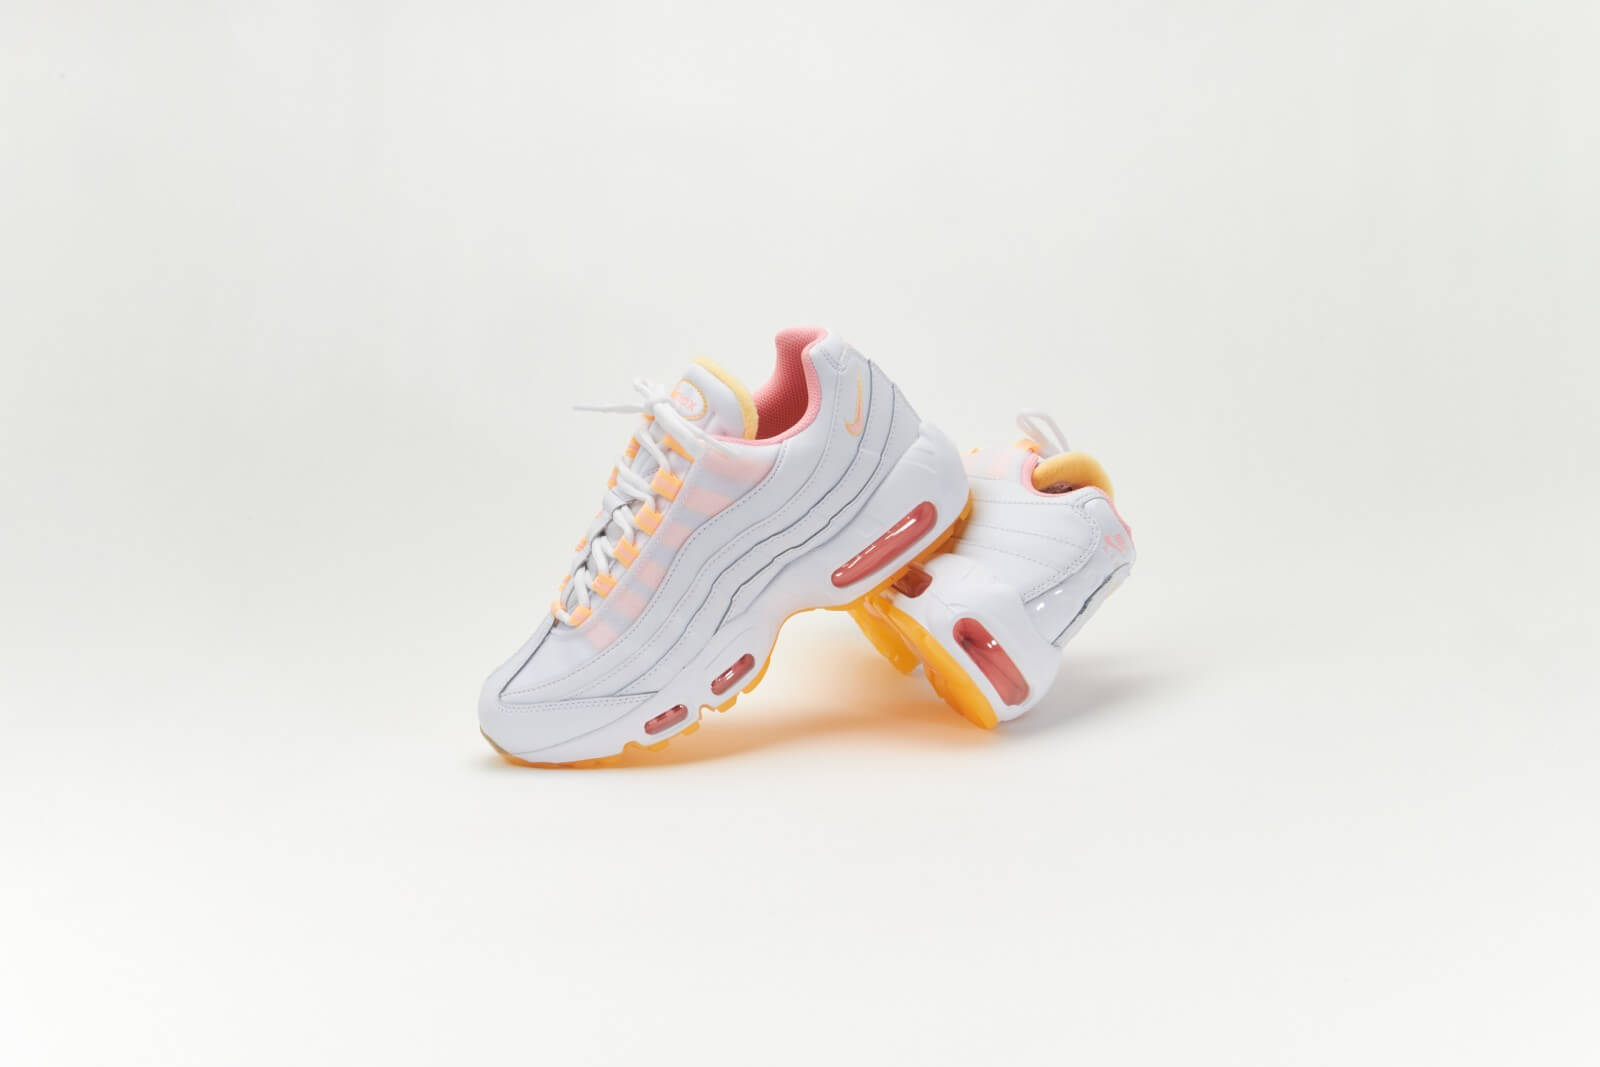 Nike Women's Air Max 95 White/Arctic Punch-Melon Tint